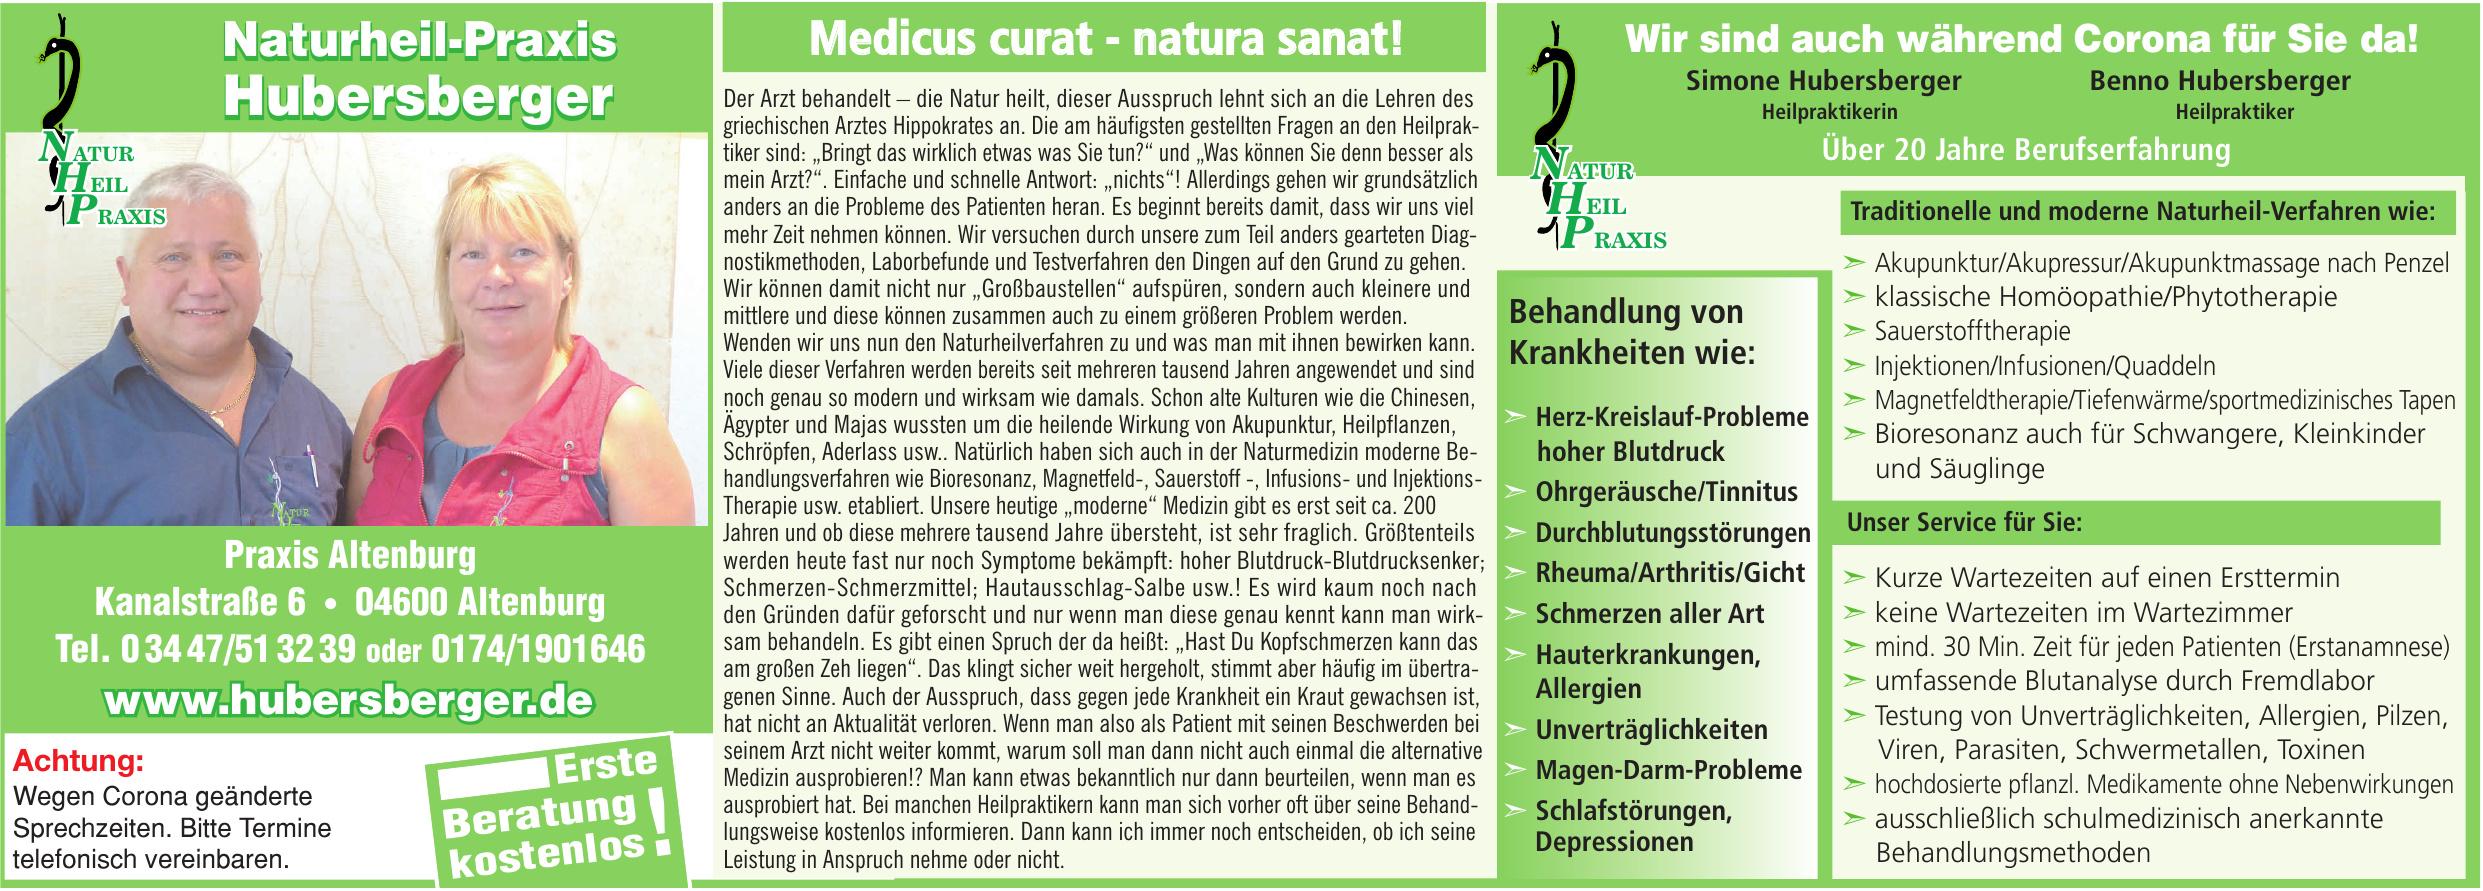 Naturheil-Praxis Hubersberger